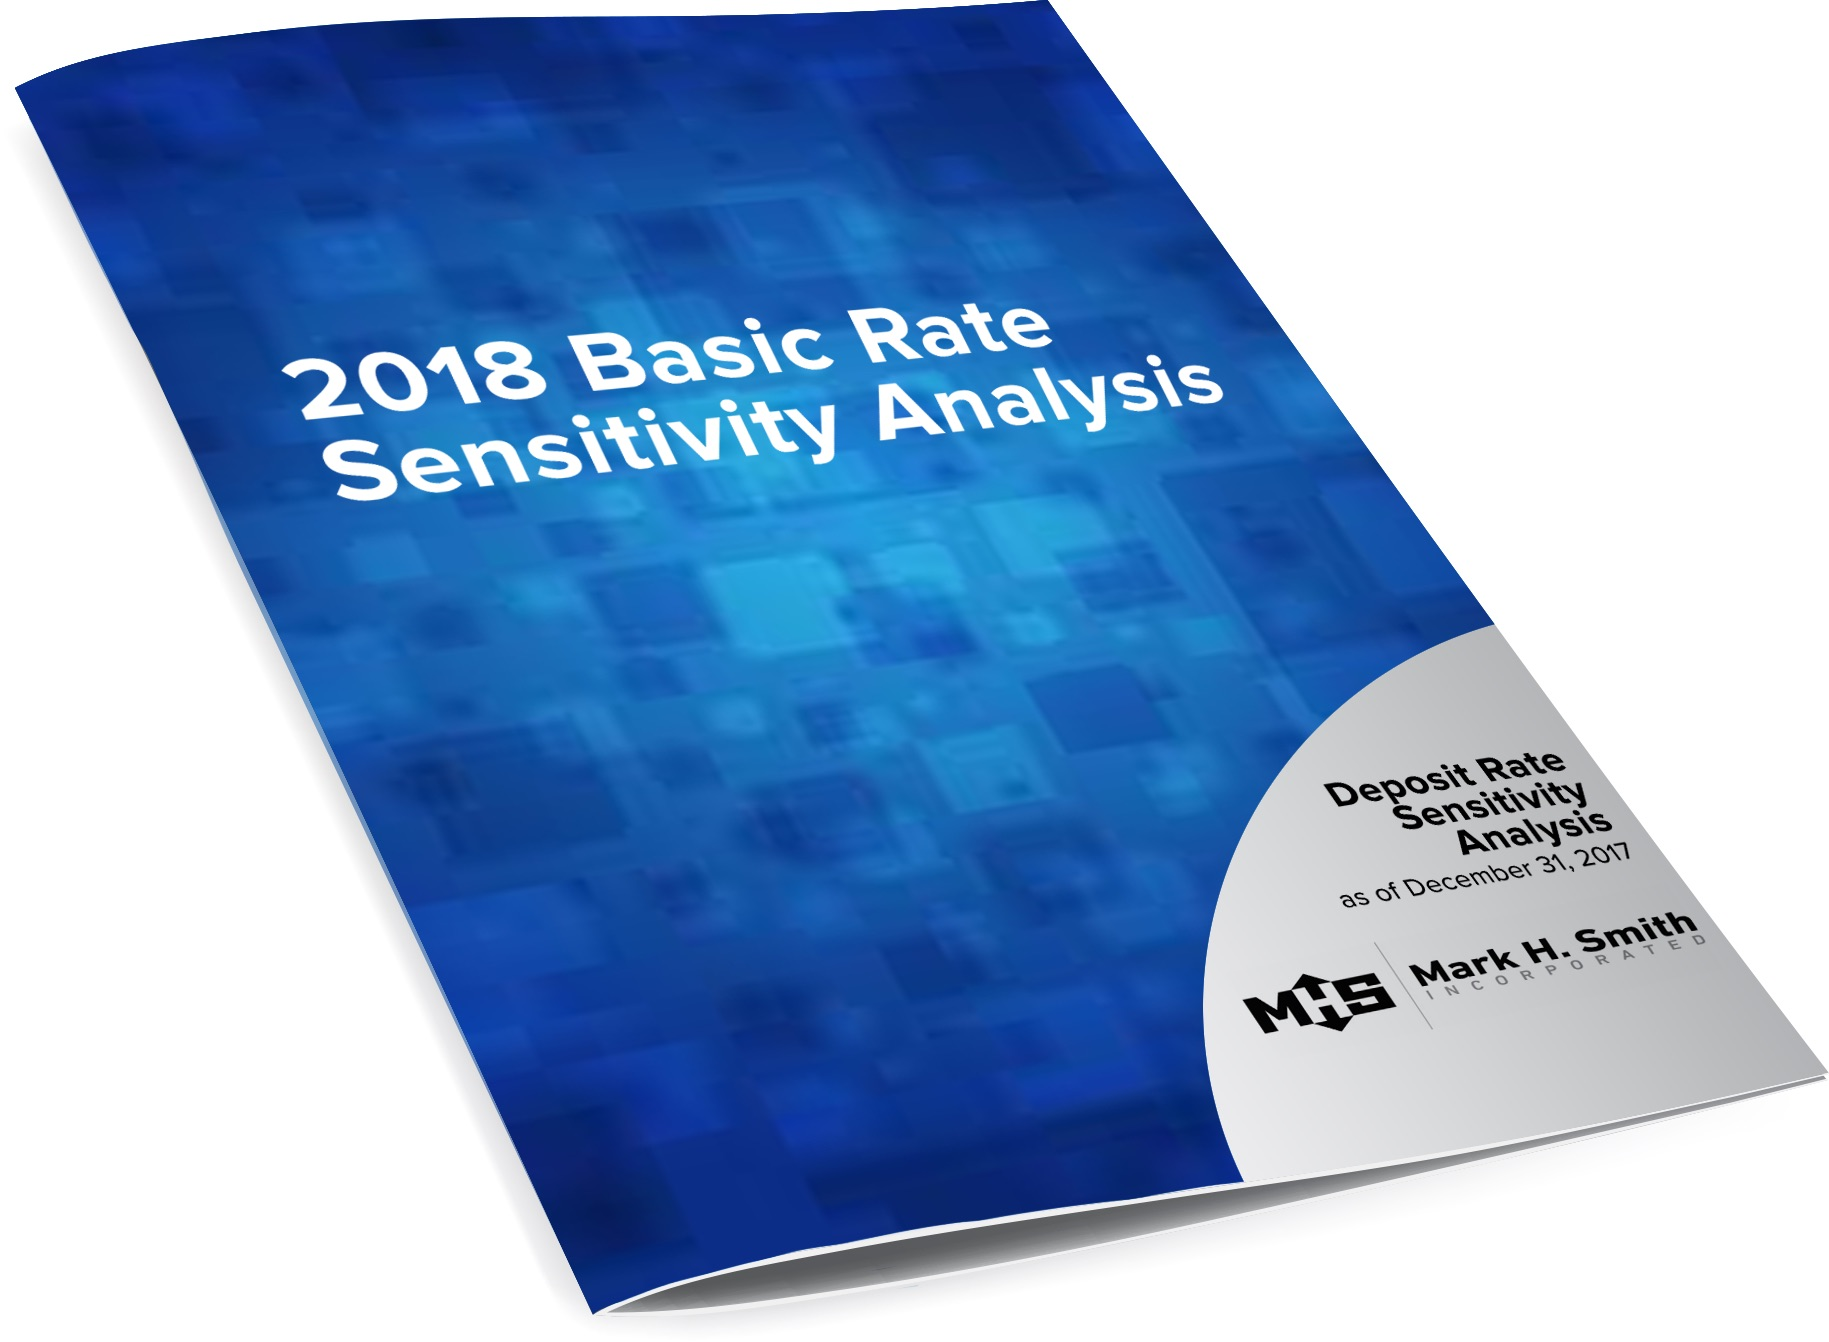 Mark H. Smith Inc 2018 Basic Rate Sensitivity Analysis